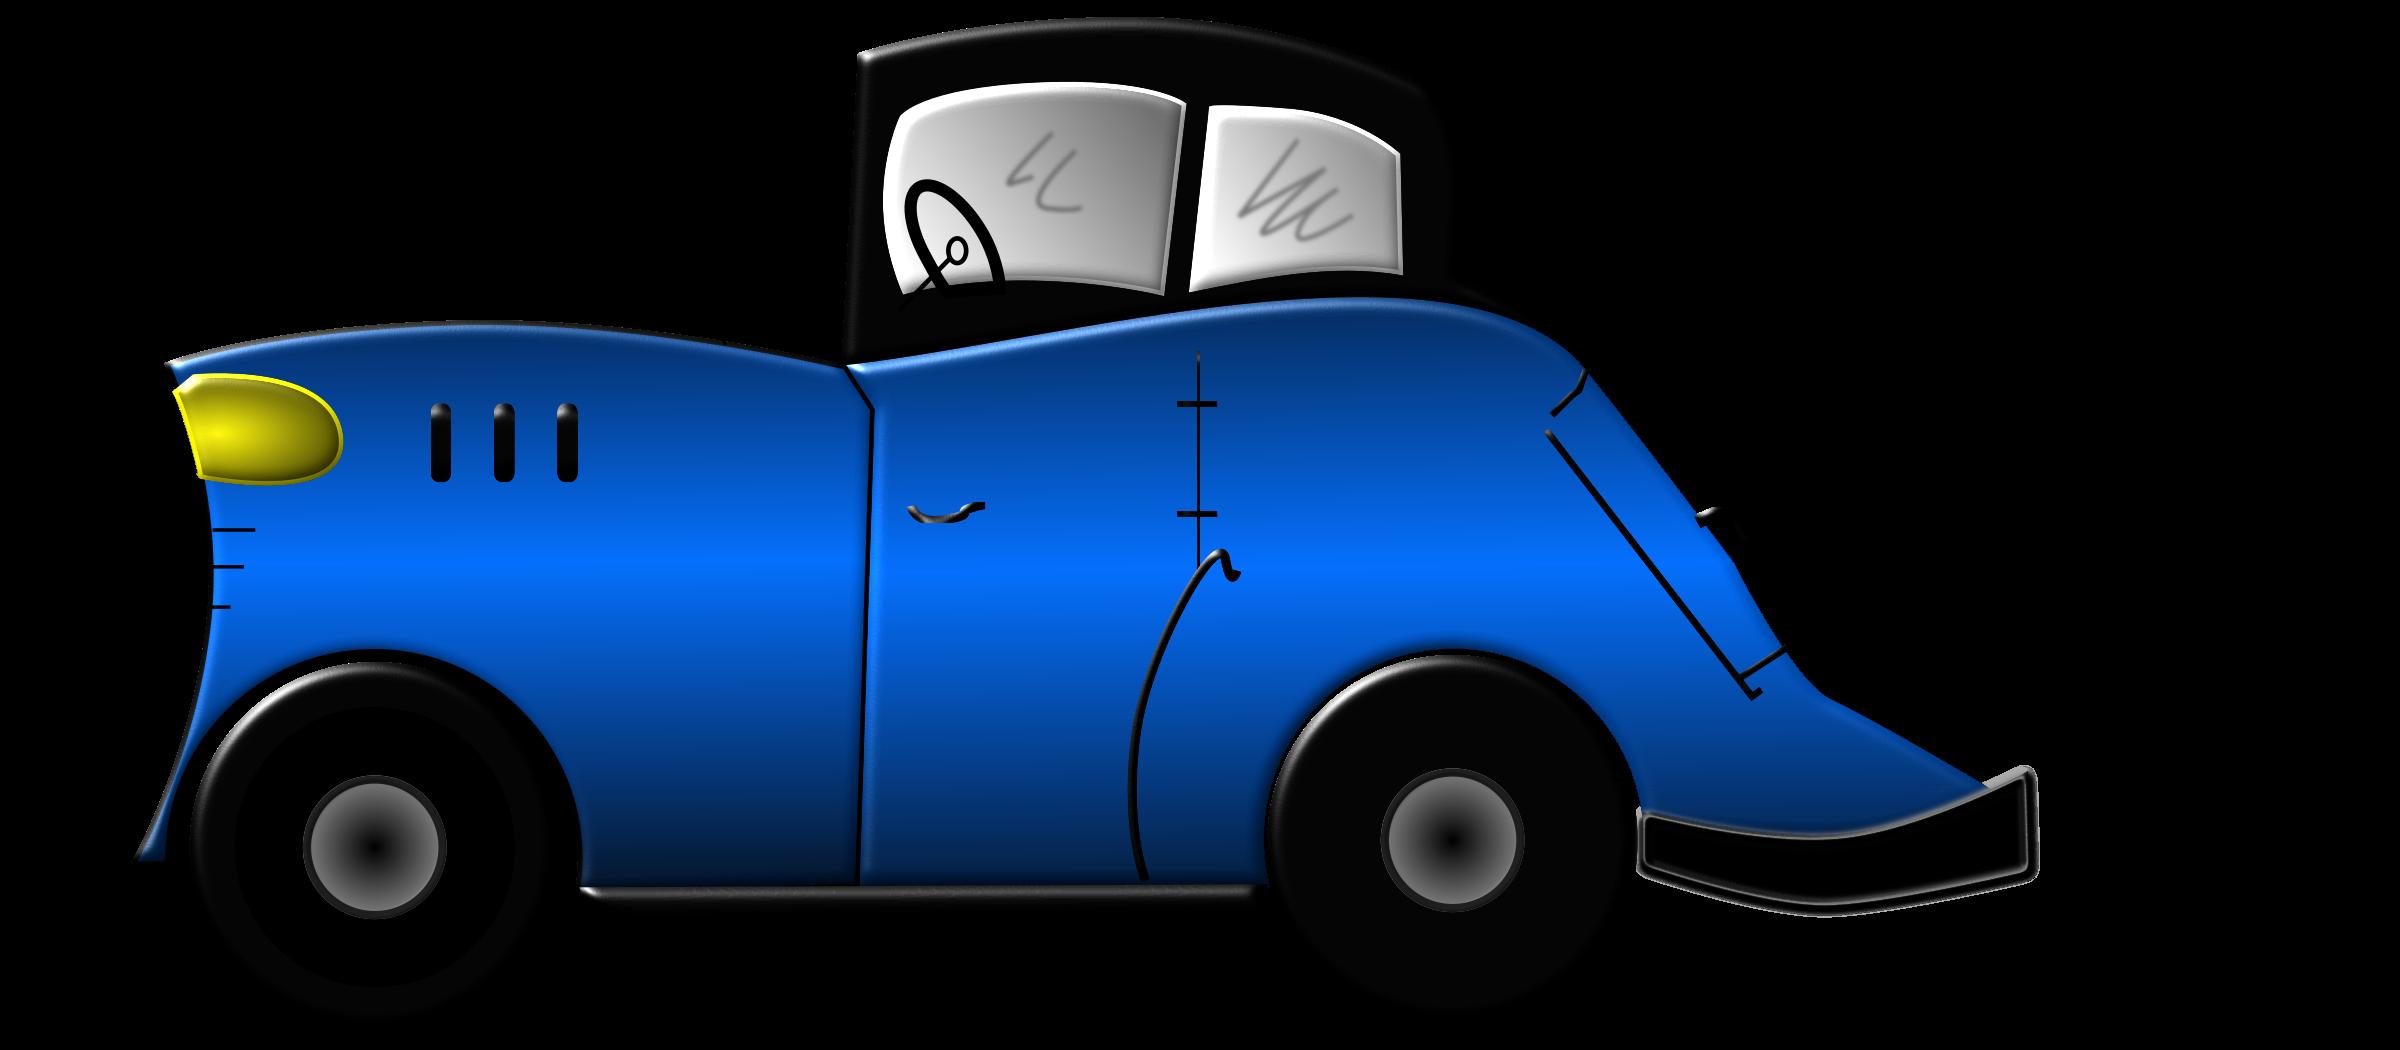 Blue Car clipart cartoon Car Car Clipart Cartoon Cartoon